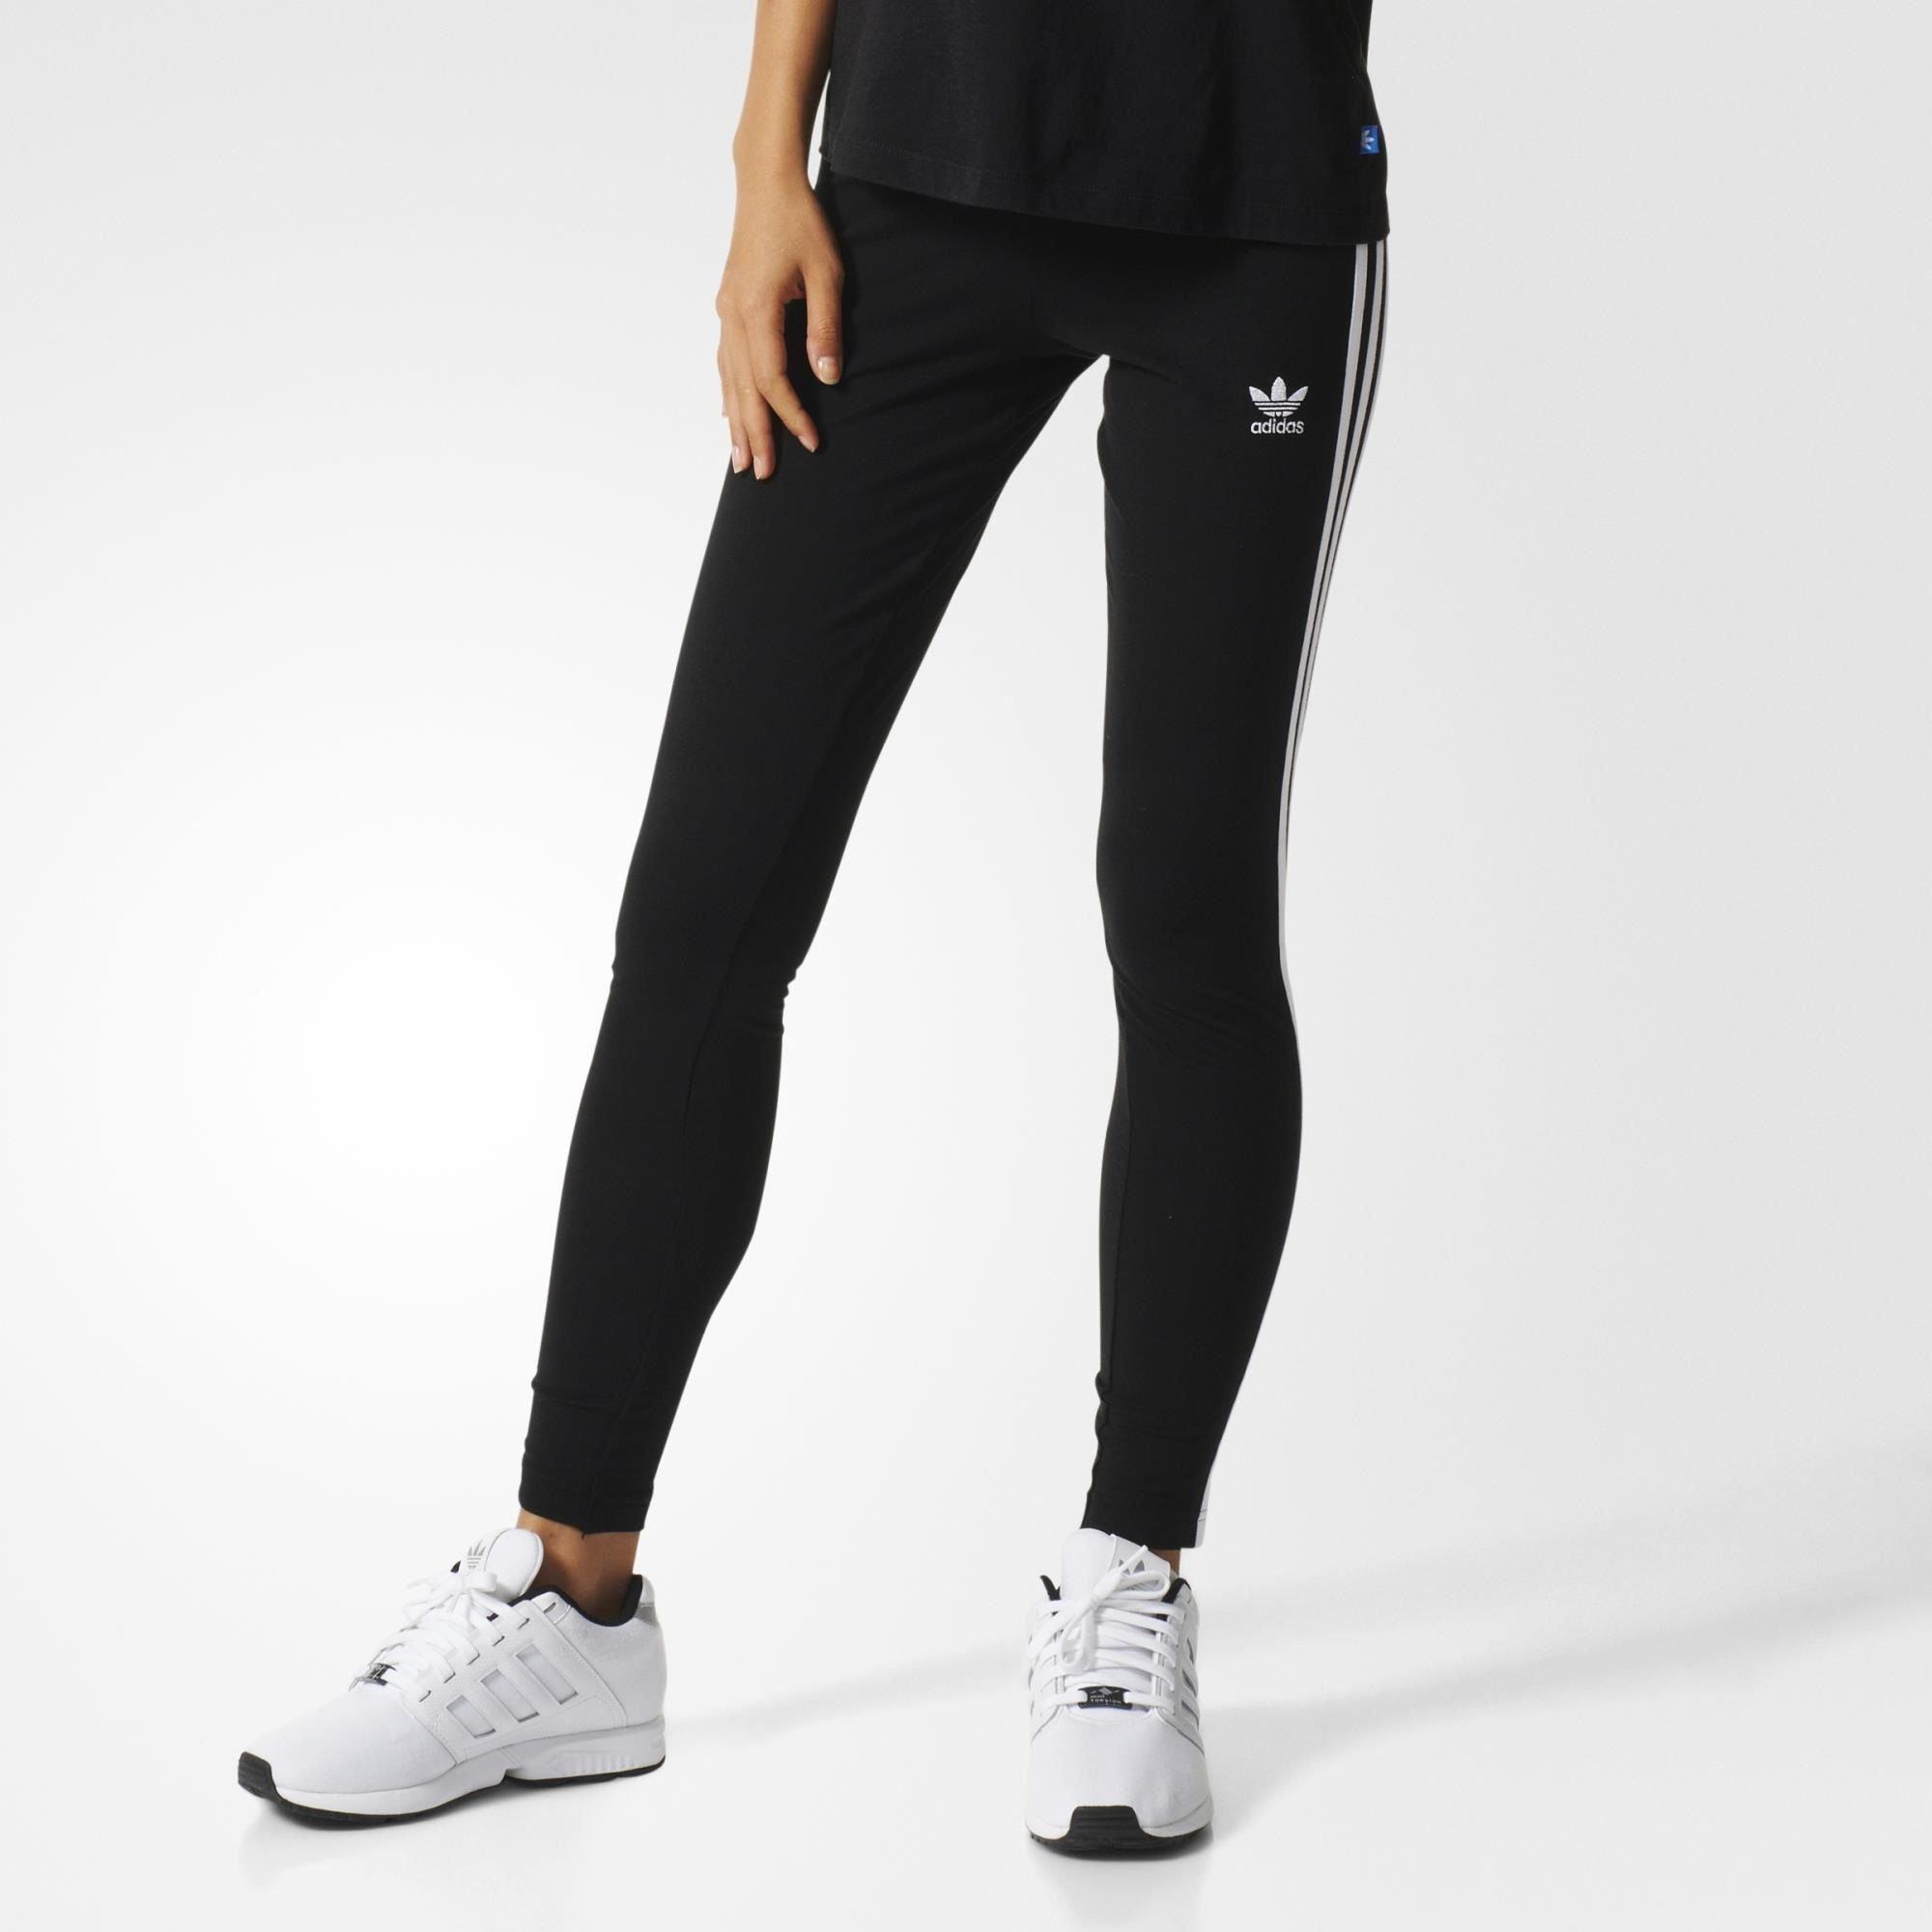 57ee799b3d5955 Galleon - Adidas Originals Women's 3-Stripes Leggings, Black/Trefoil Stripe,  Large (US Size) (US Size)